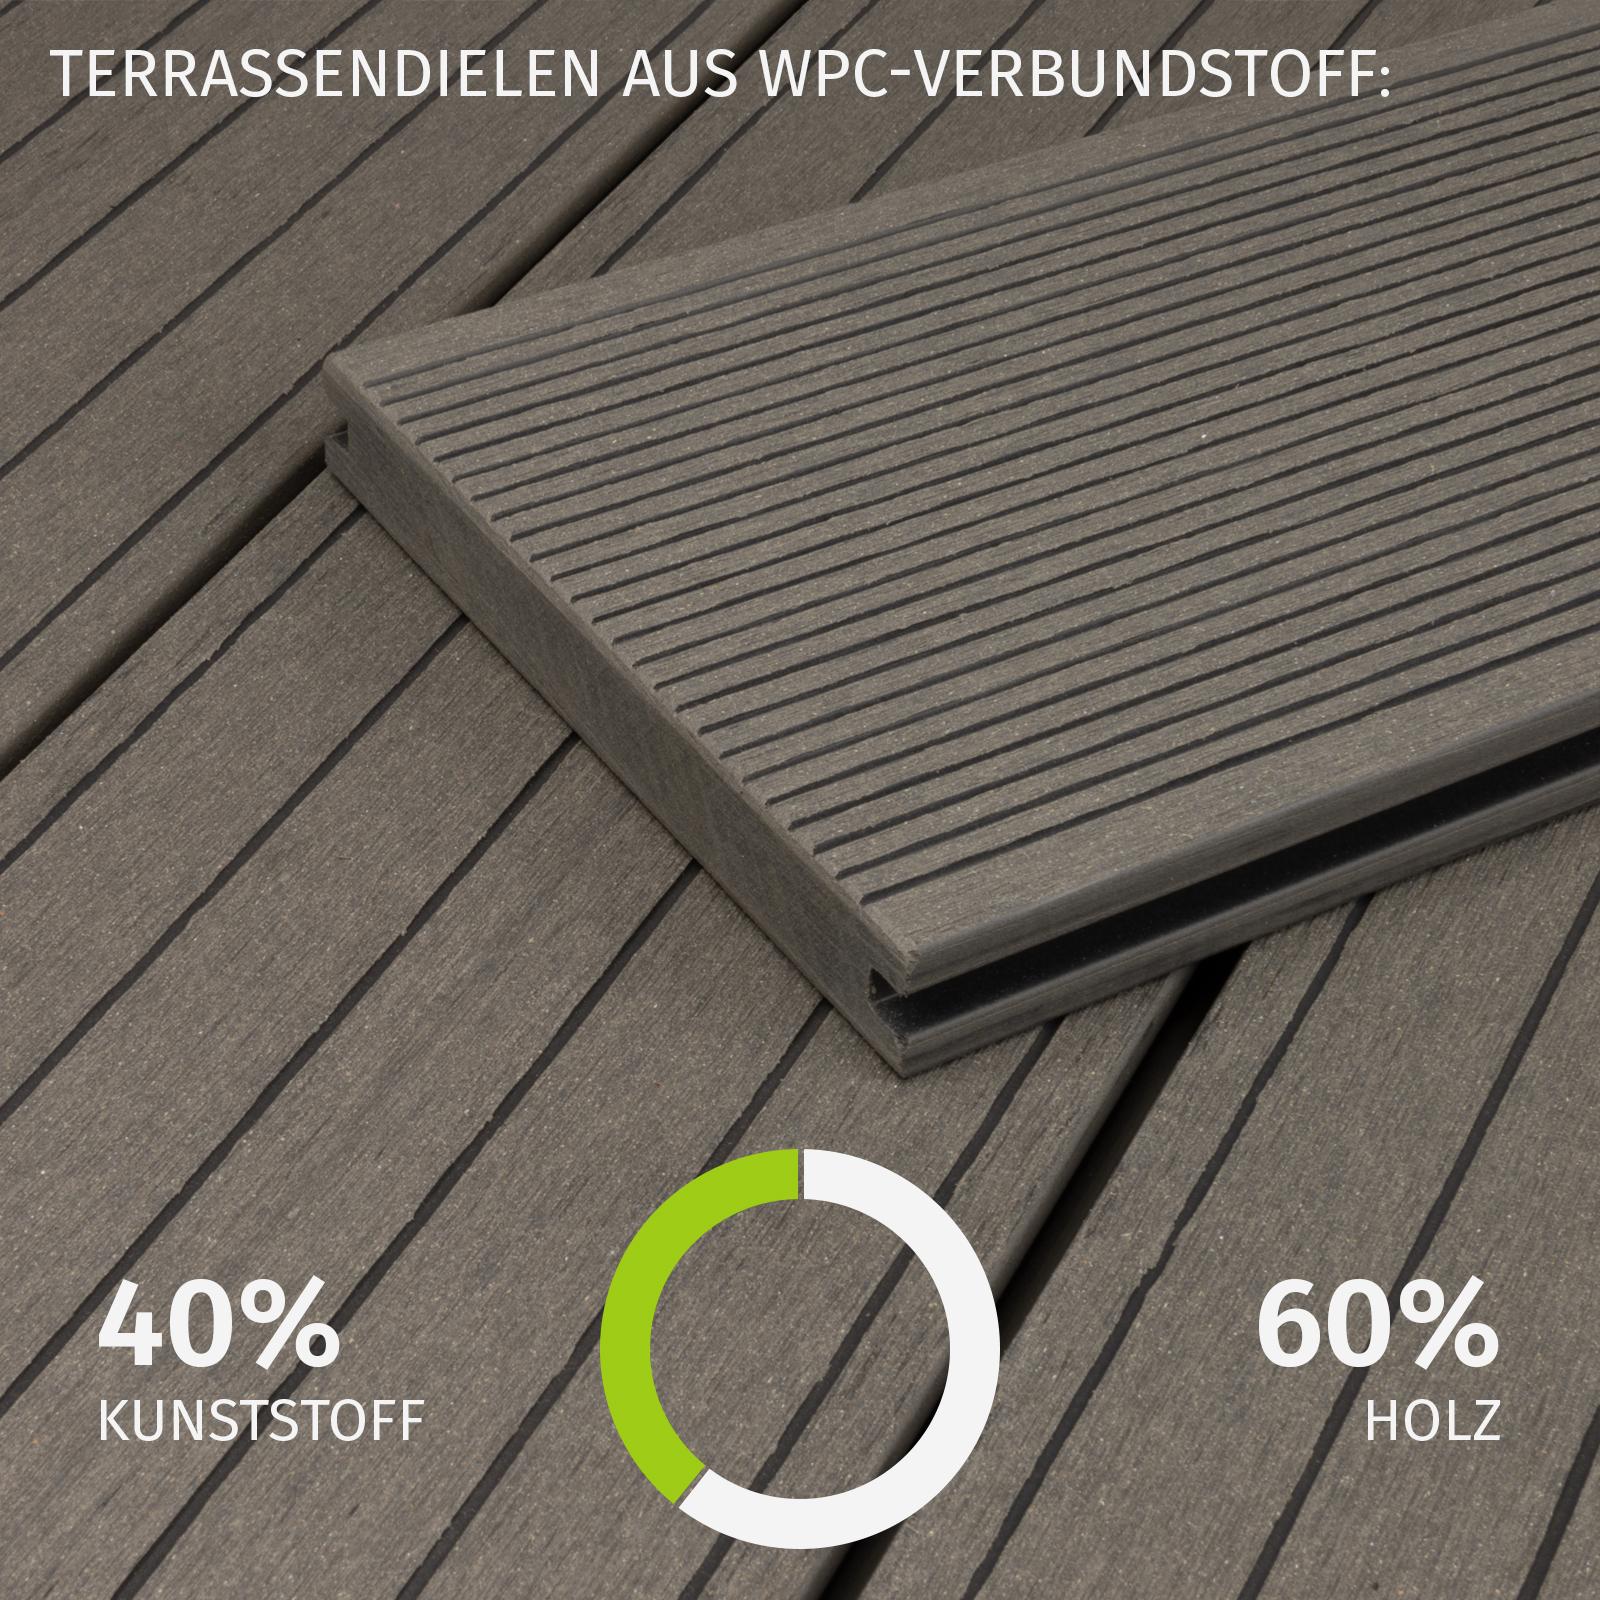 WPC Komplettset Braun Terrassendielen 1.WAHL Terrassendiele Komplettbausatz Holz